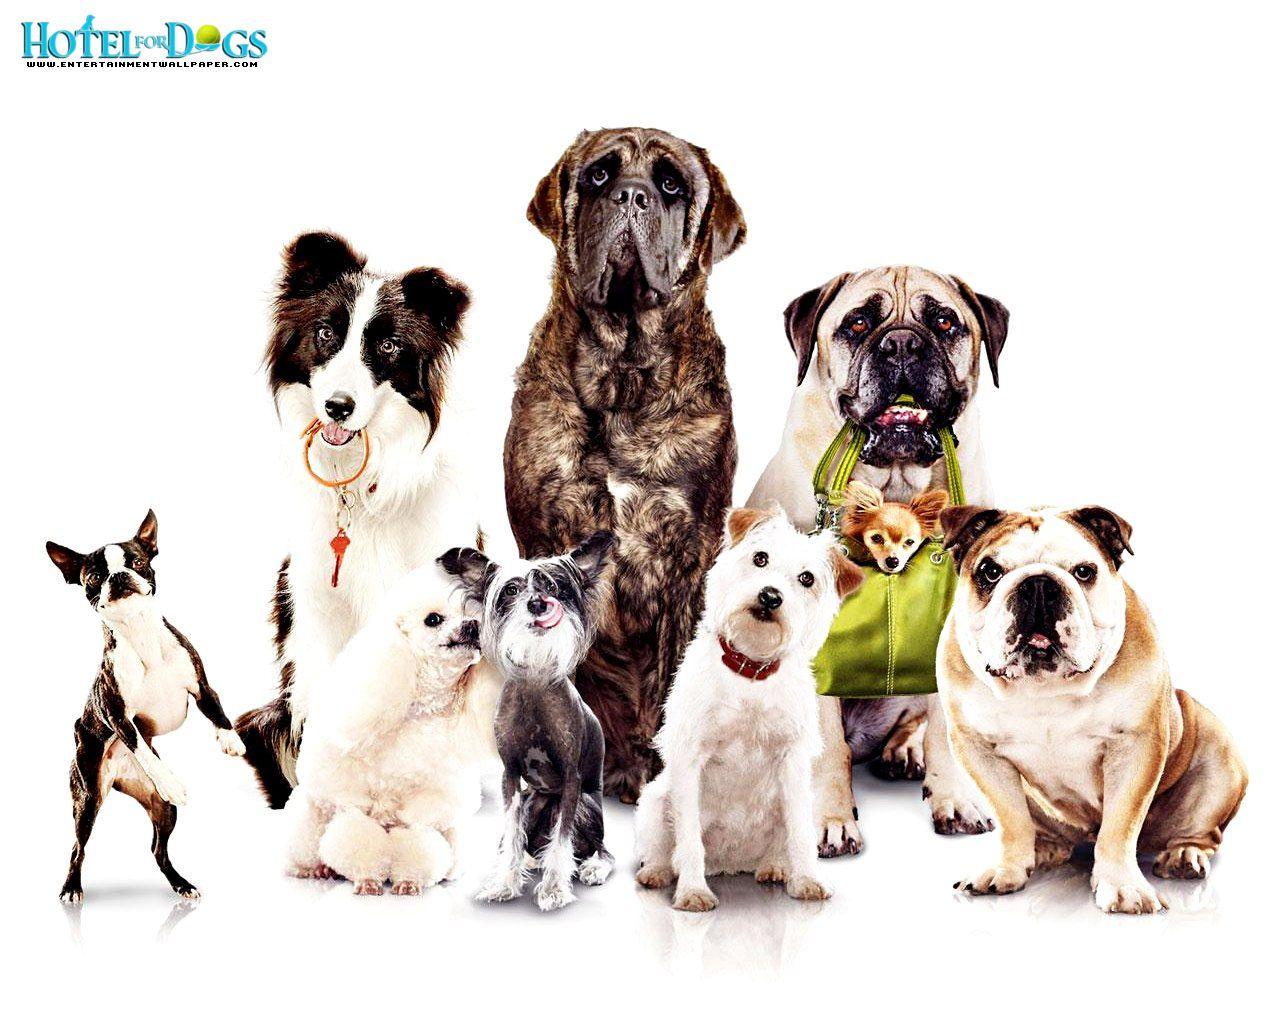 Dogs Wallpaper desktop download wallpaper of animals | download wallpaper